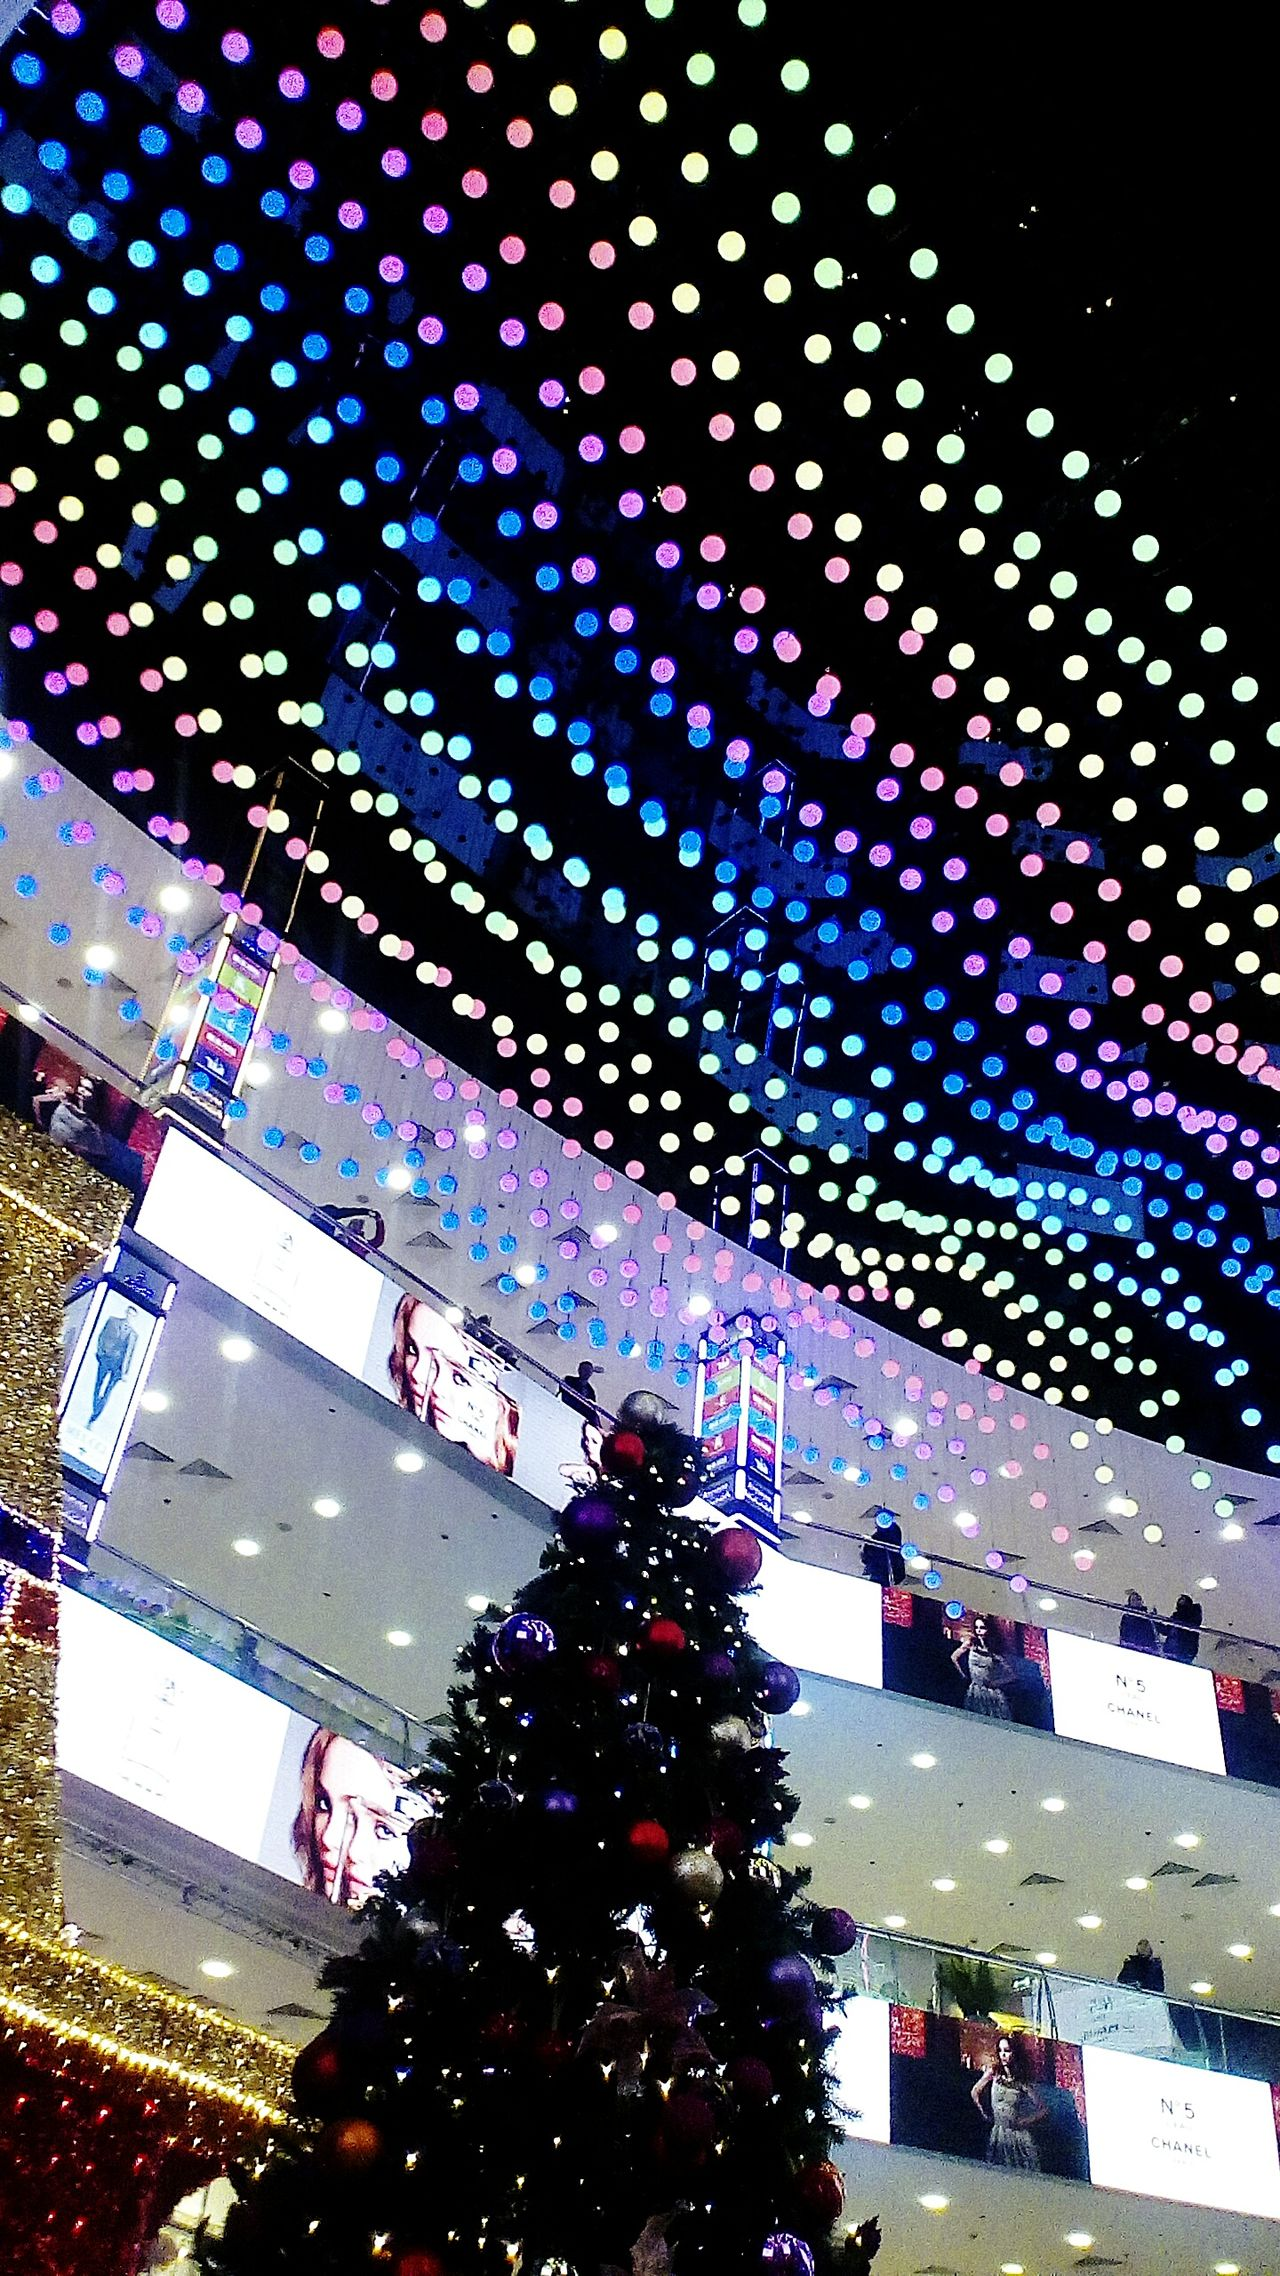 Illuminated Multi Colored Architecture No People First Eyeem Photo Followforfollow Followme Followback Follow4follow Eyeemphotography Modern Photooftheday Indoors  Eurovision2015